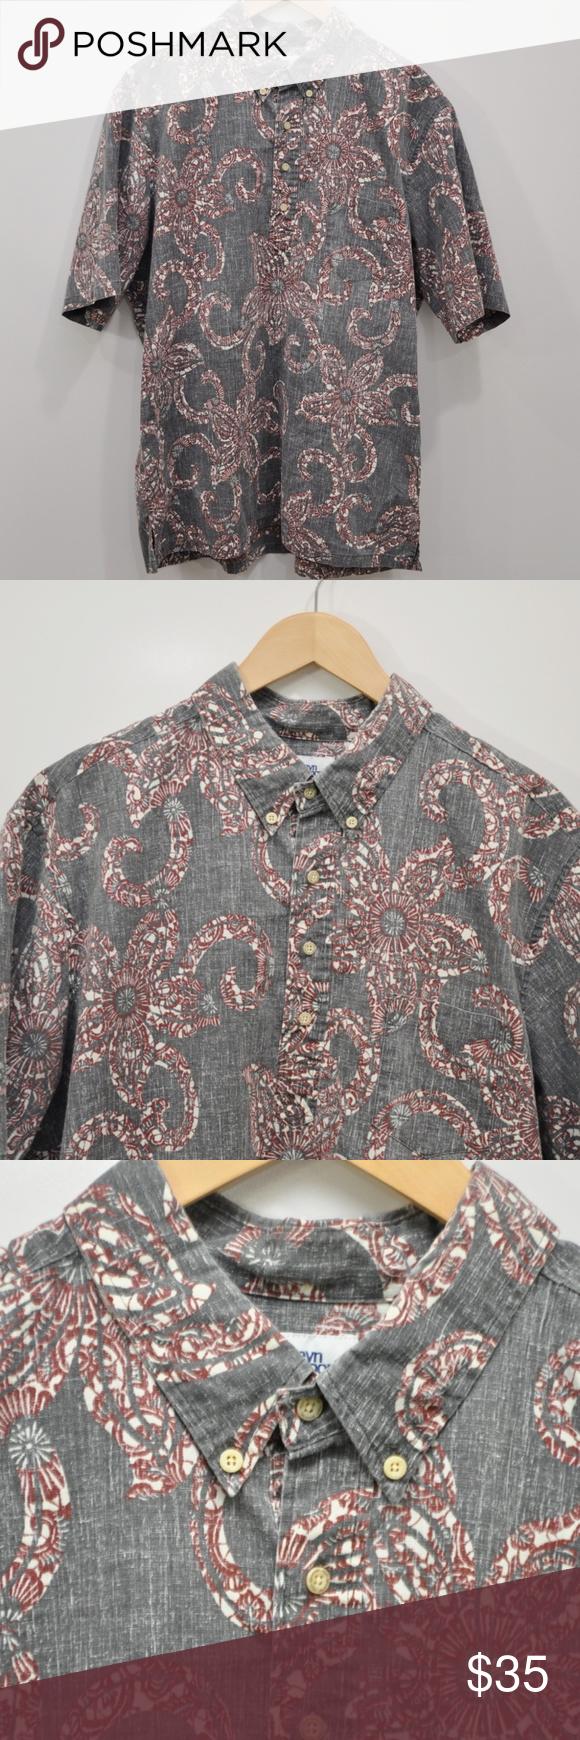 9ac738be8 Reyn Spooner Pullover Hawaiian Shirt Reyn Spooner Pullover Hawaiian Shirt  Reverse Print Size XXL Gray Aloha